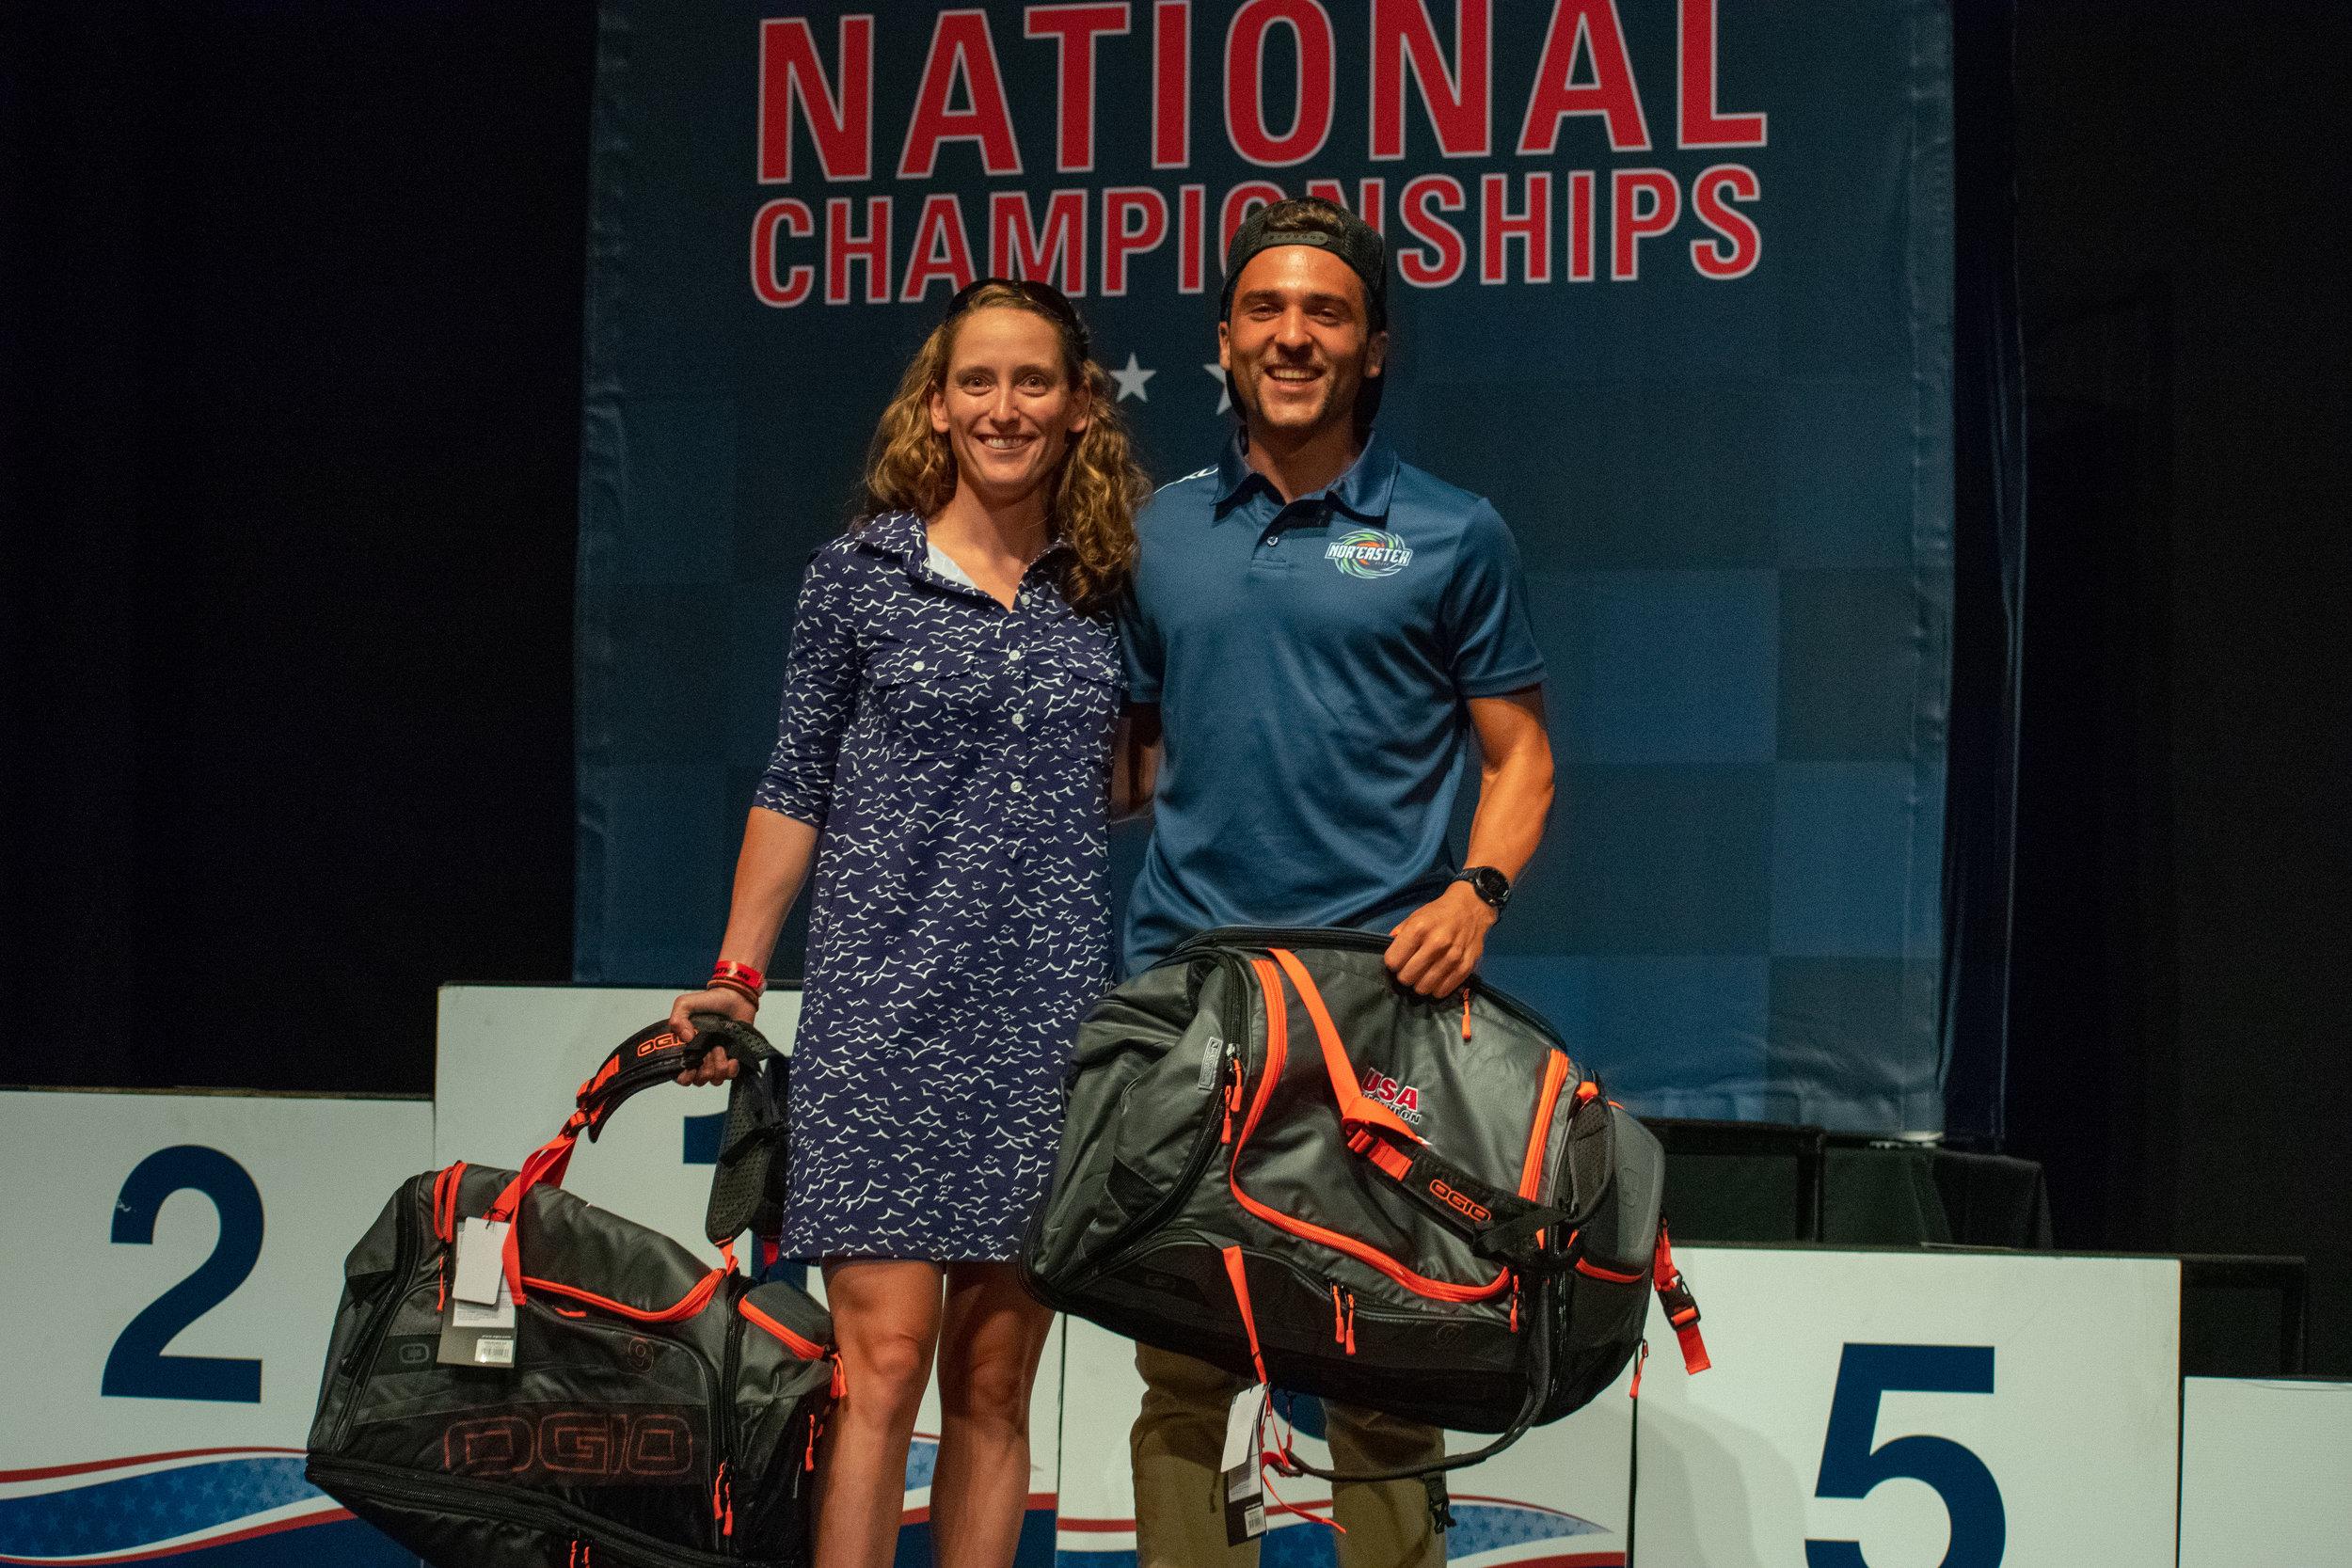 Team Nor'easter Elite SWEEPS the podium for fastest transition times (Left: Caroline Knowles)